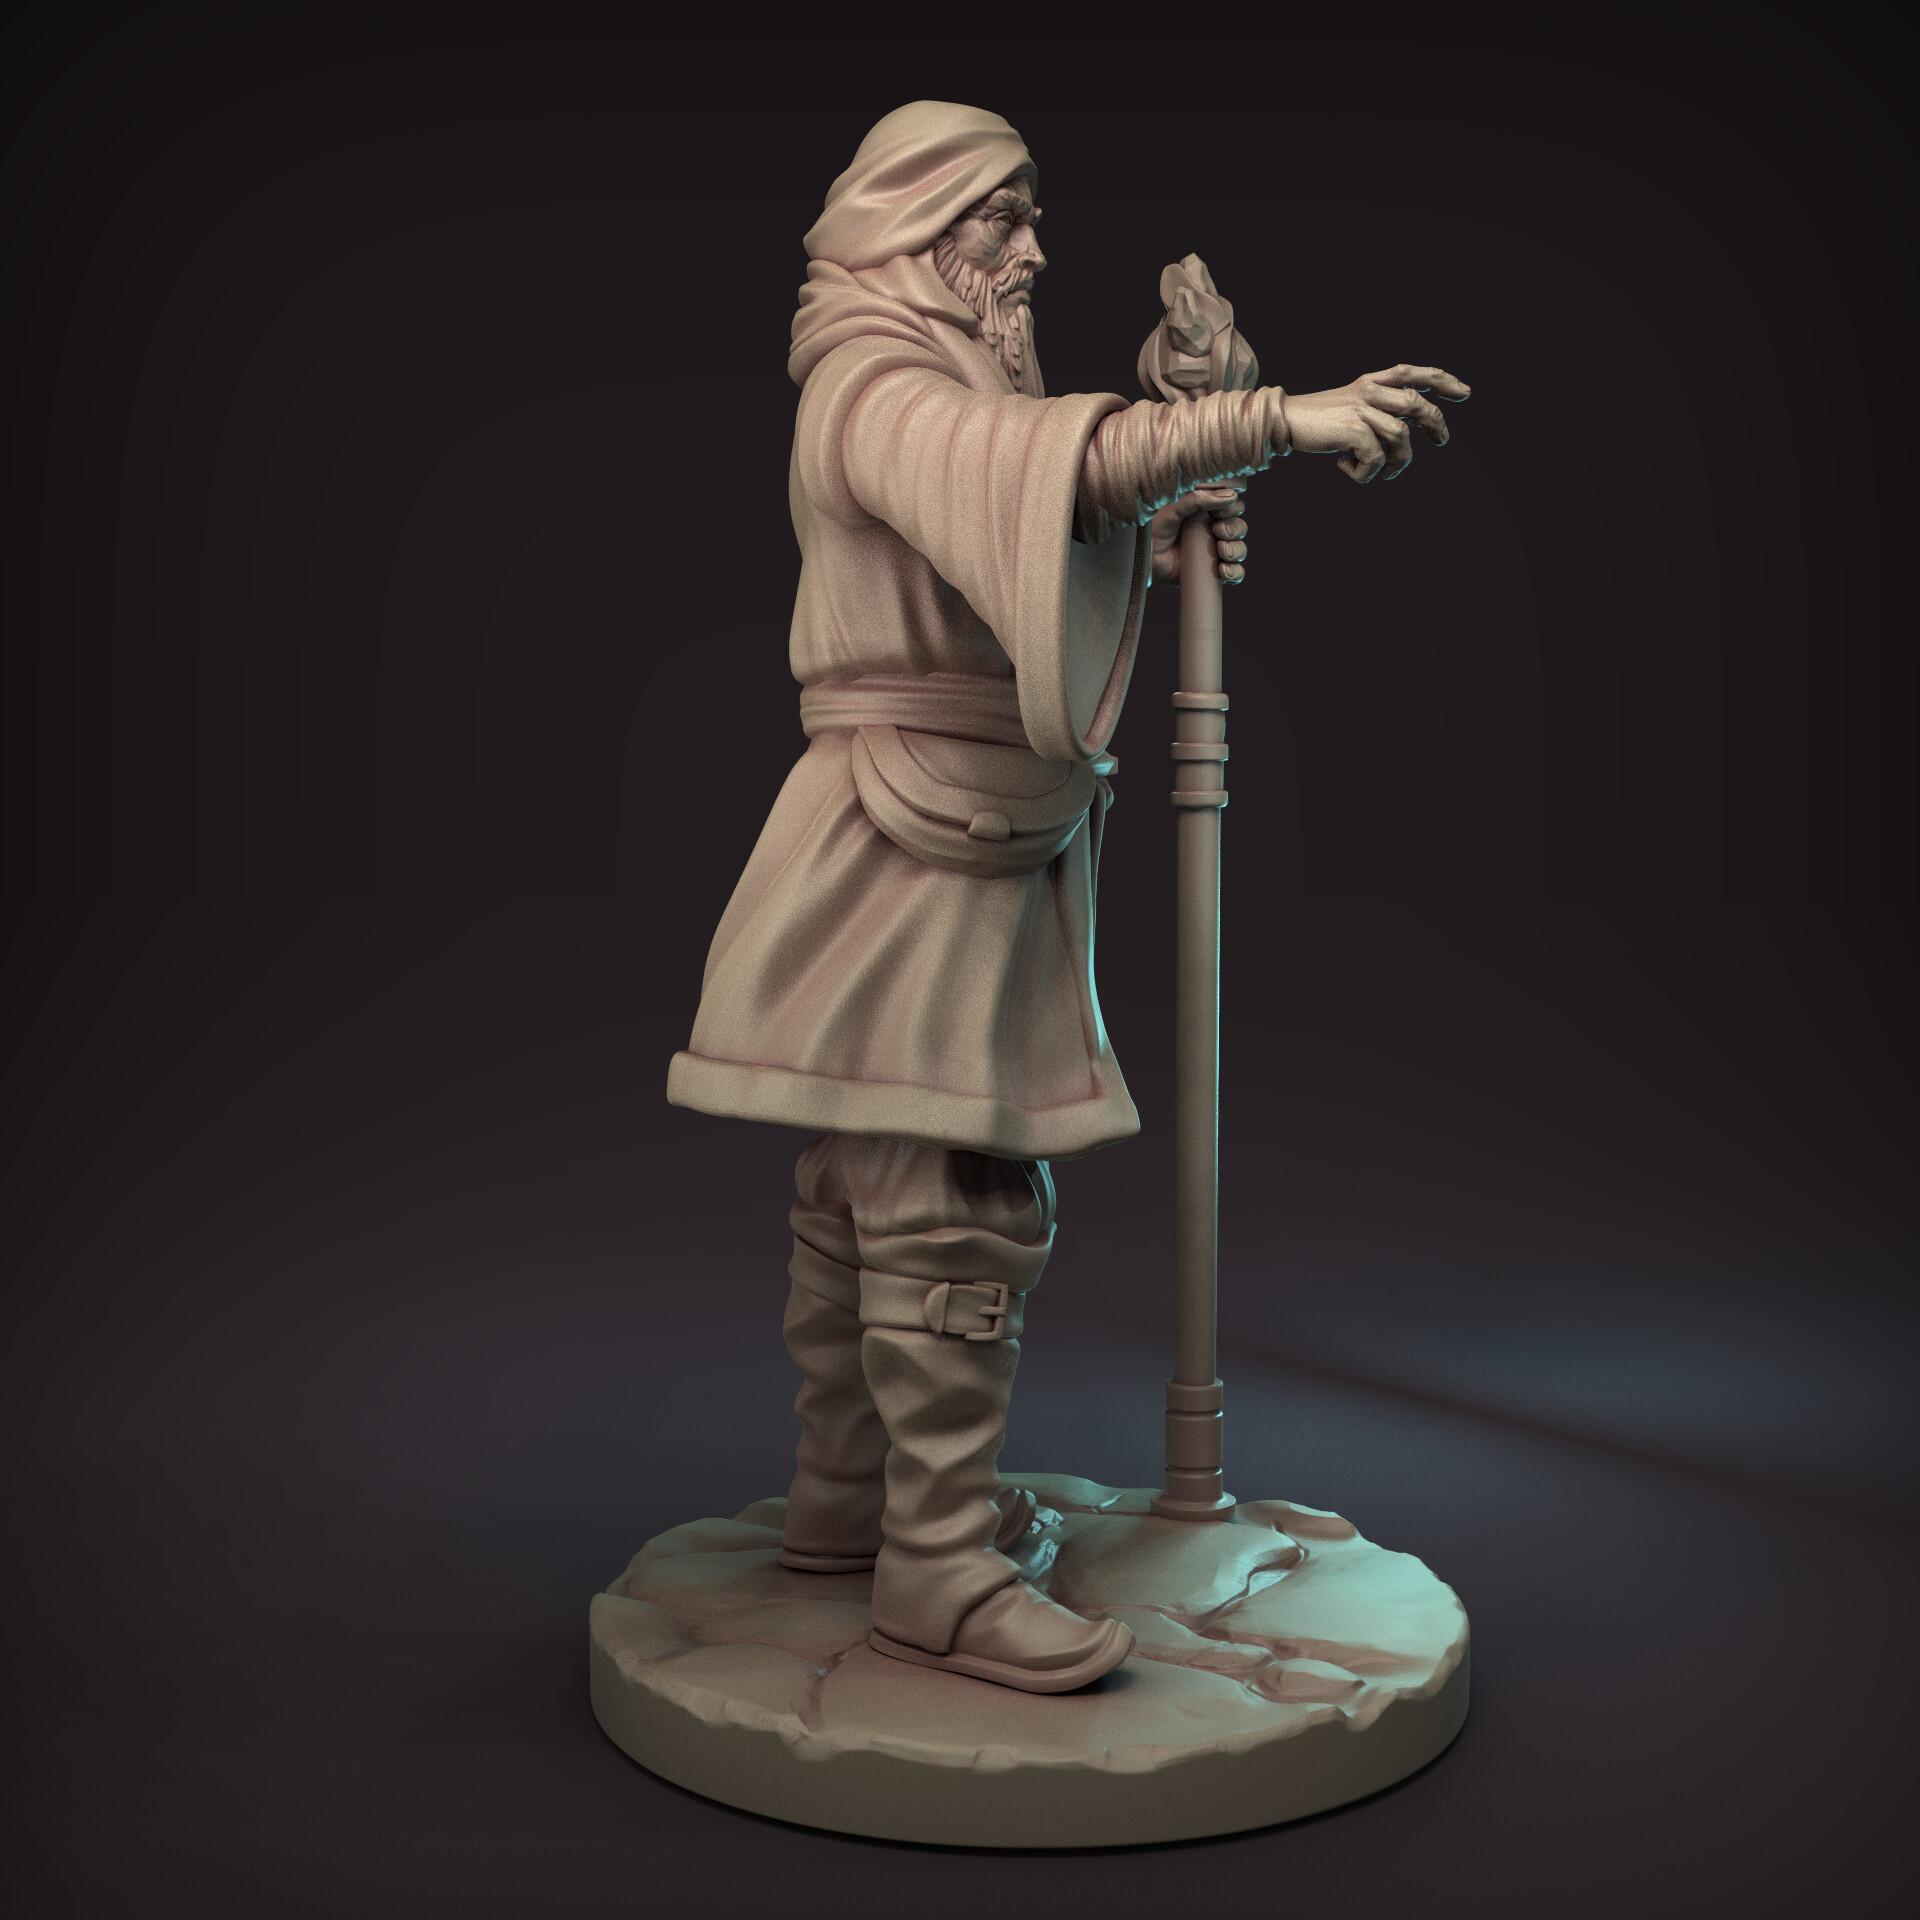 Artem bespalov ice wizard01 108